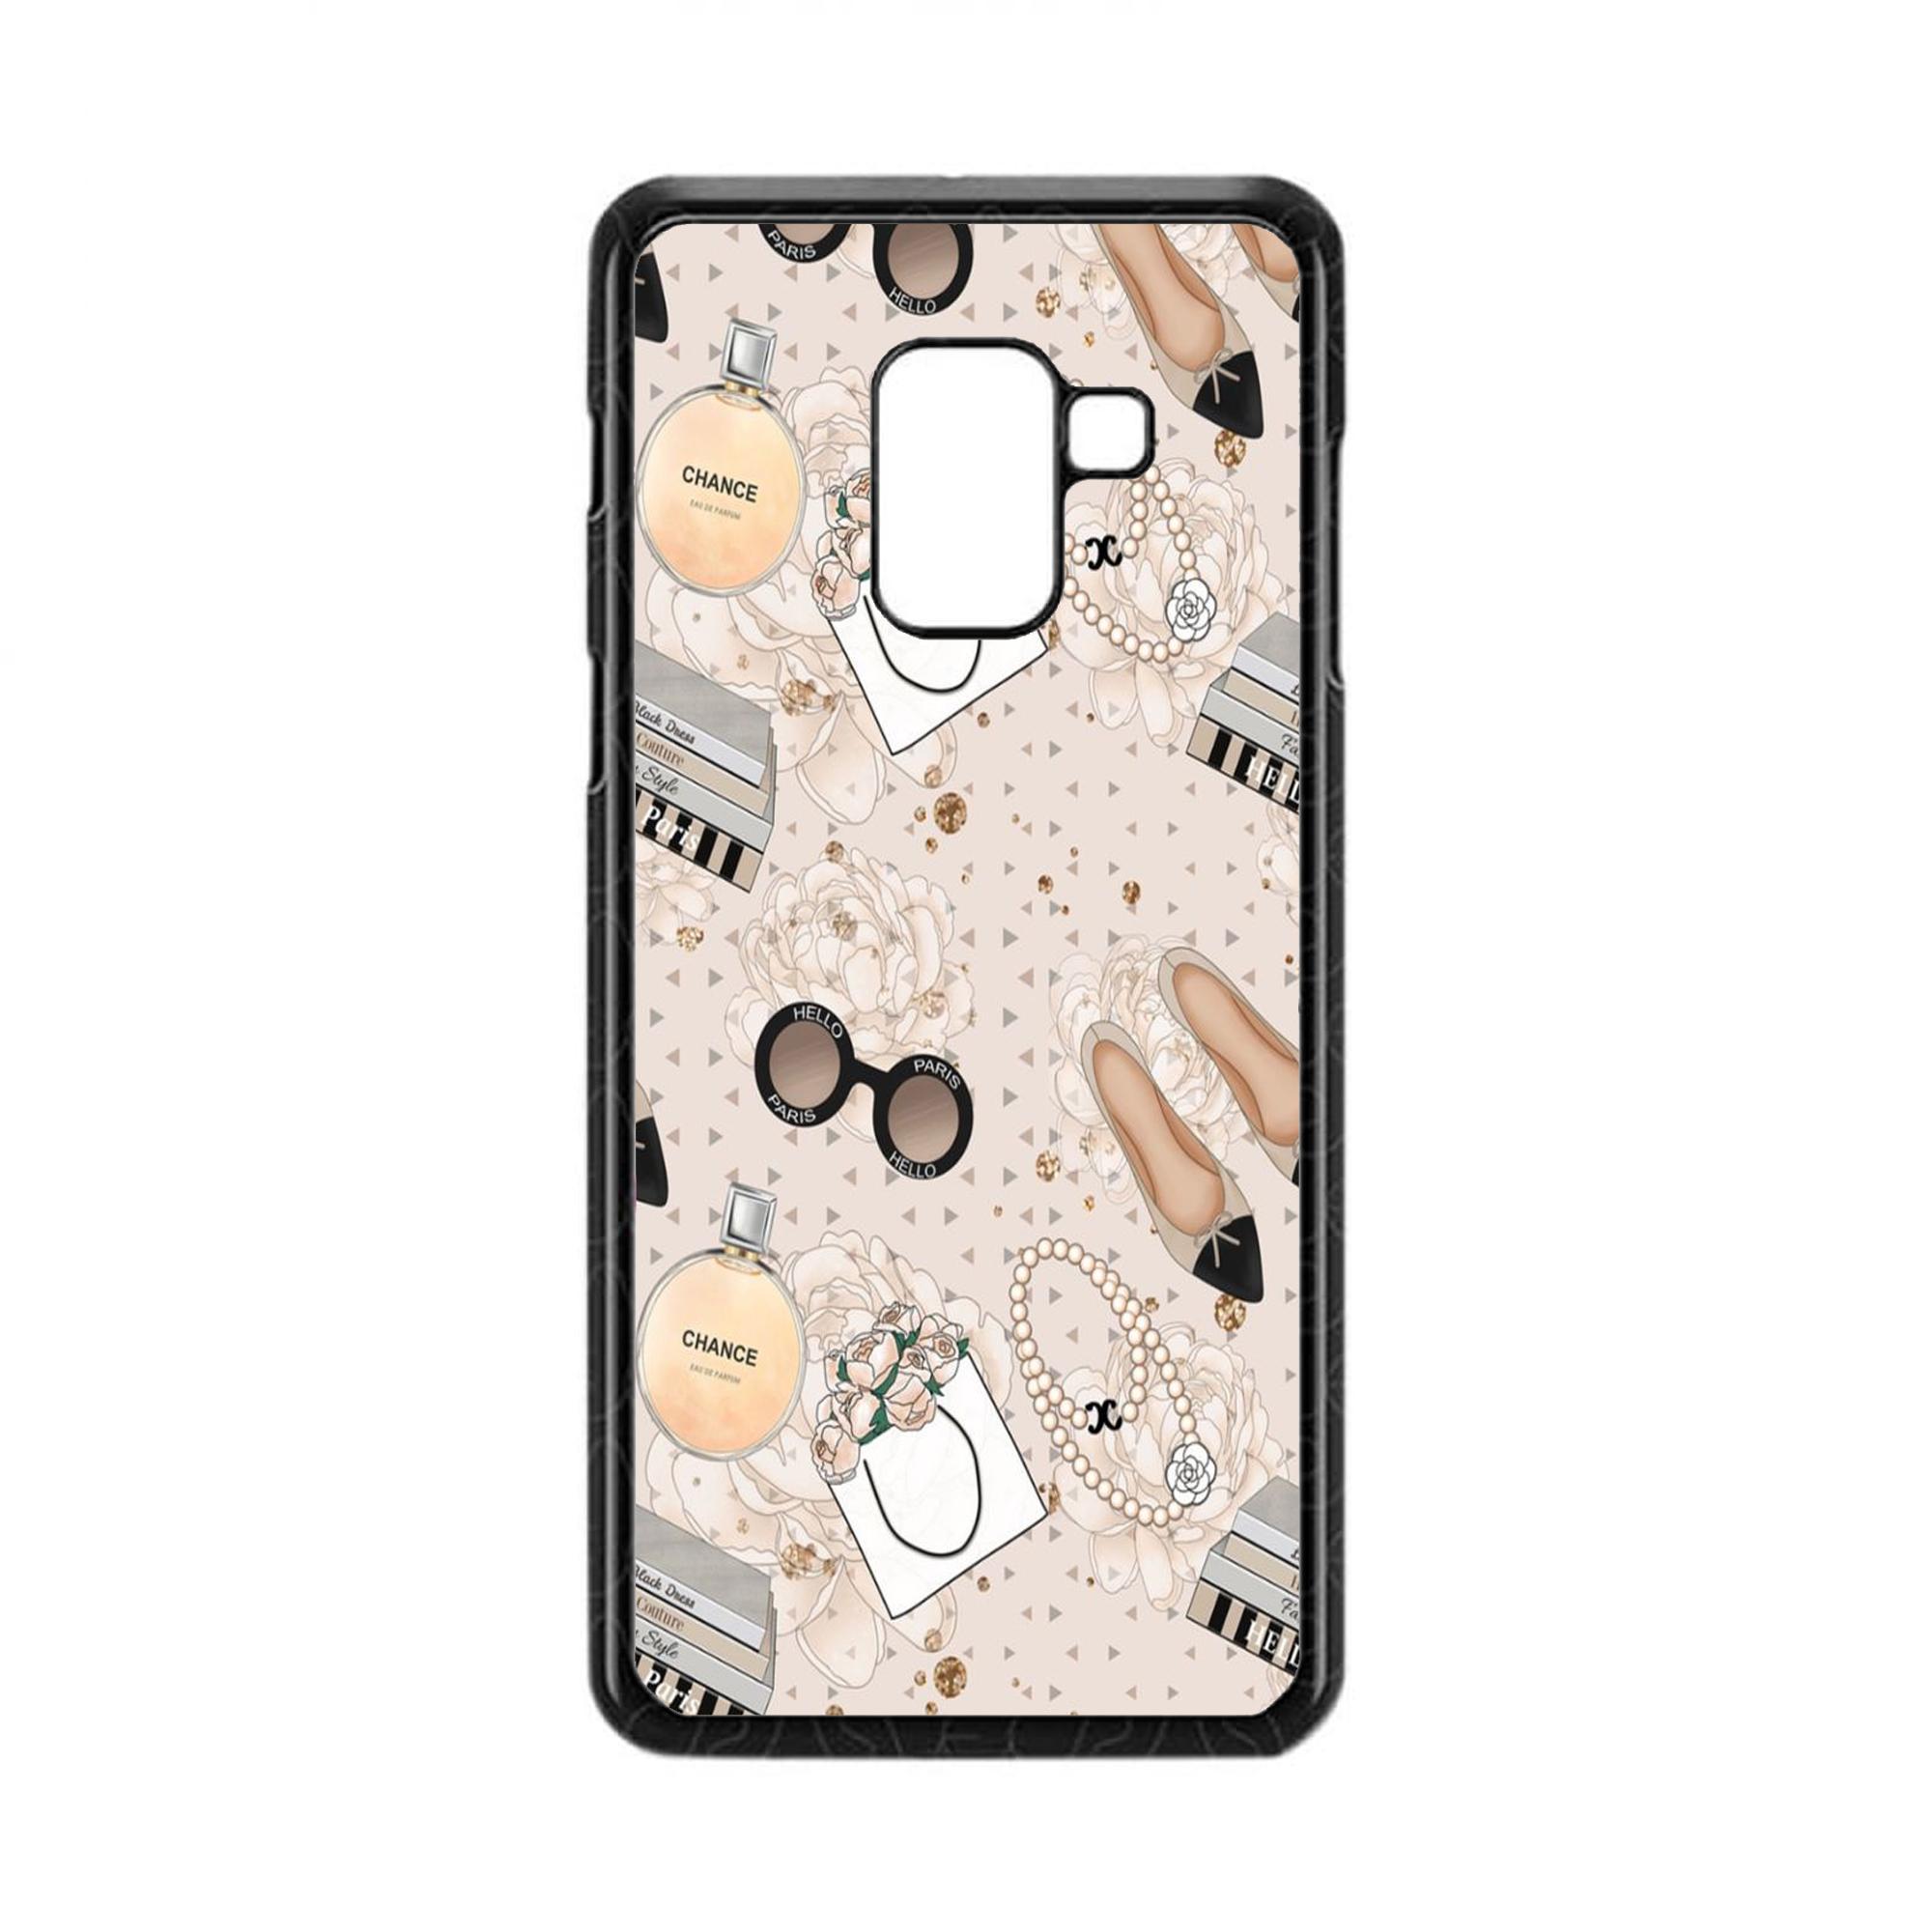 Casing Handphone/Smartphone Samsung ...